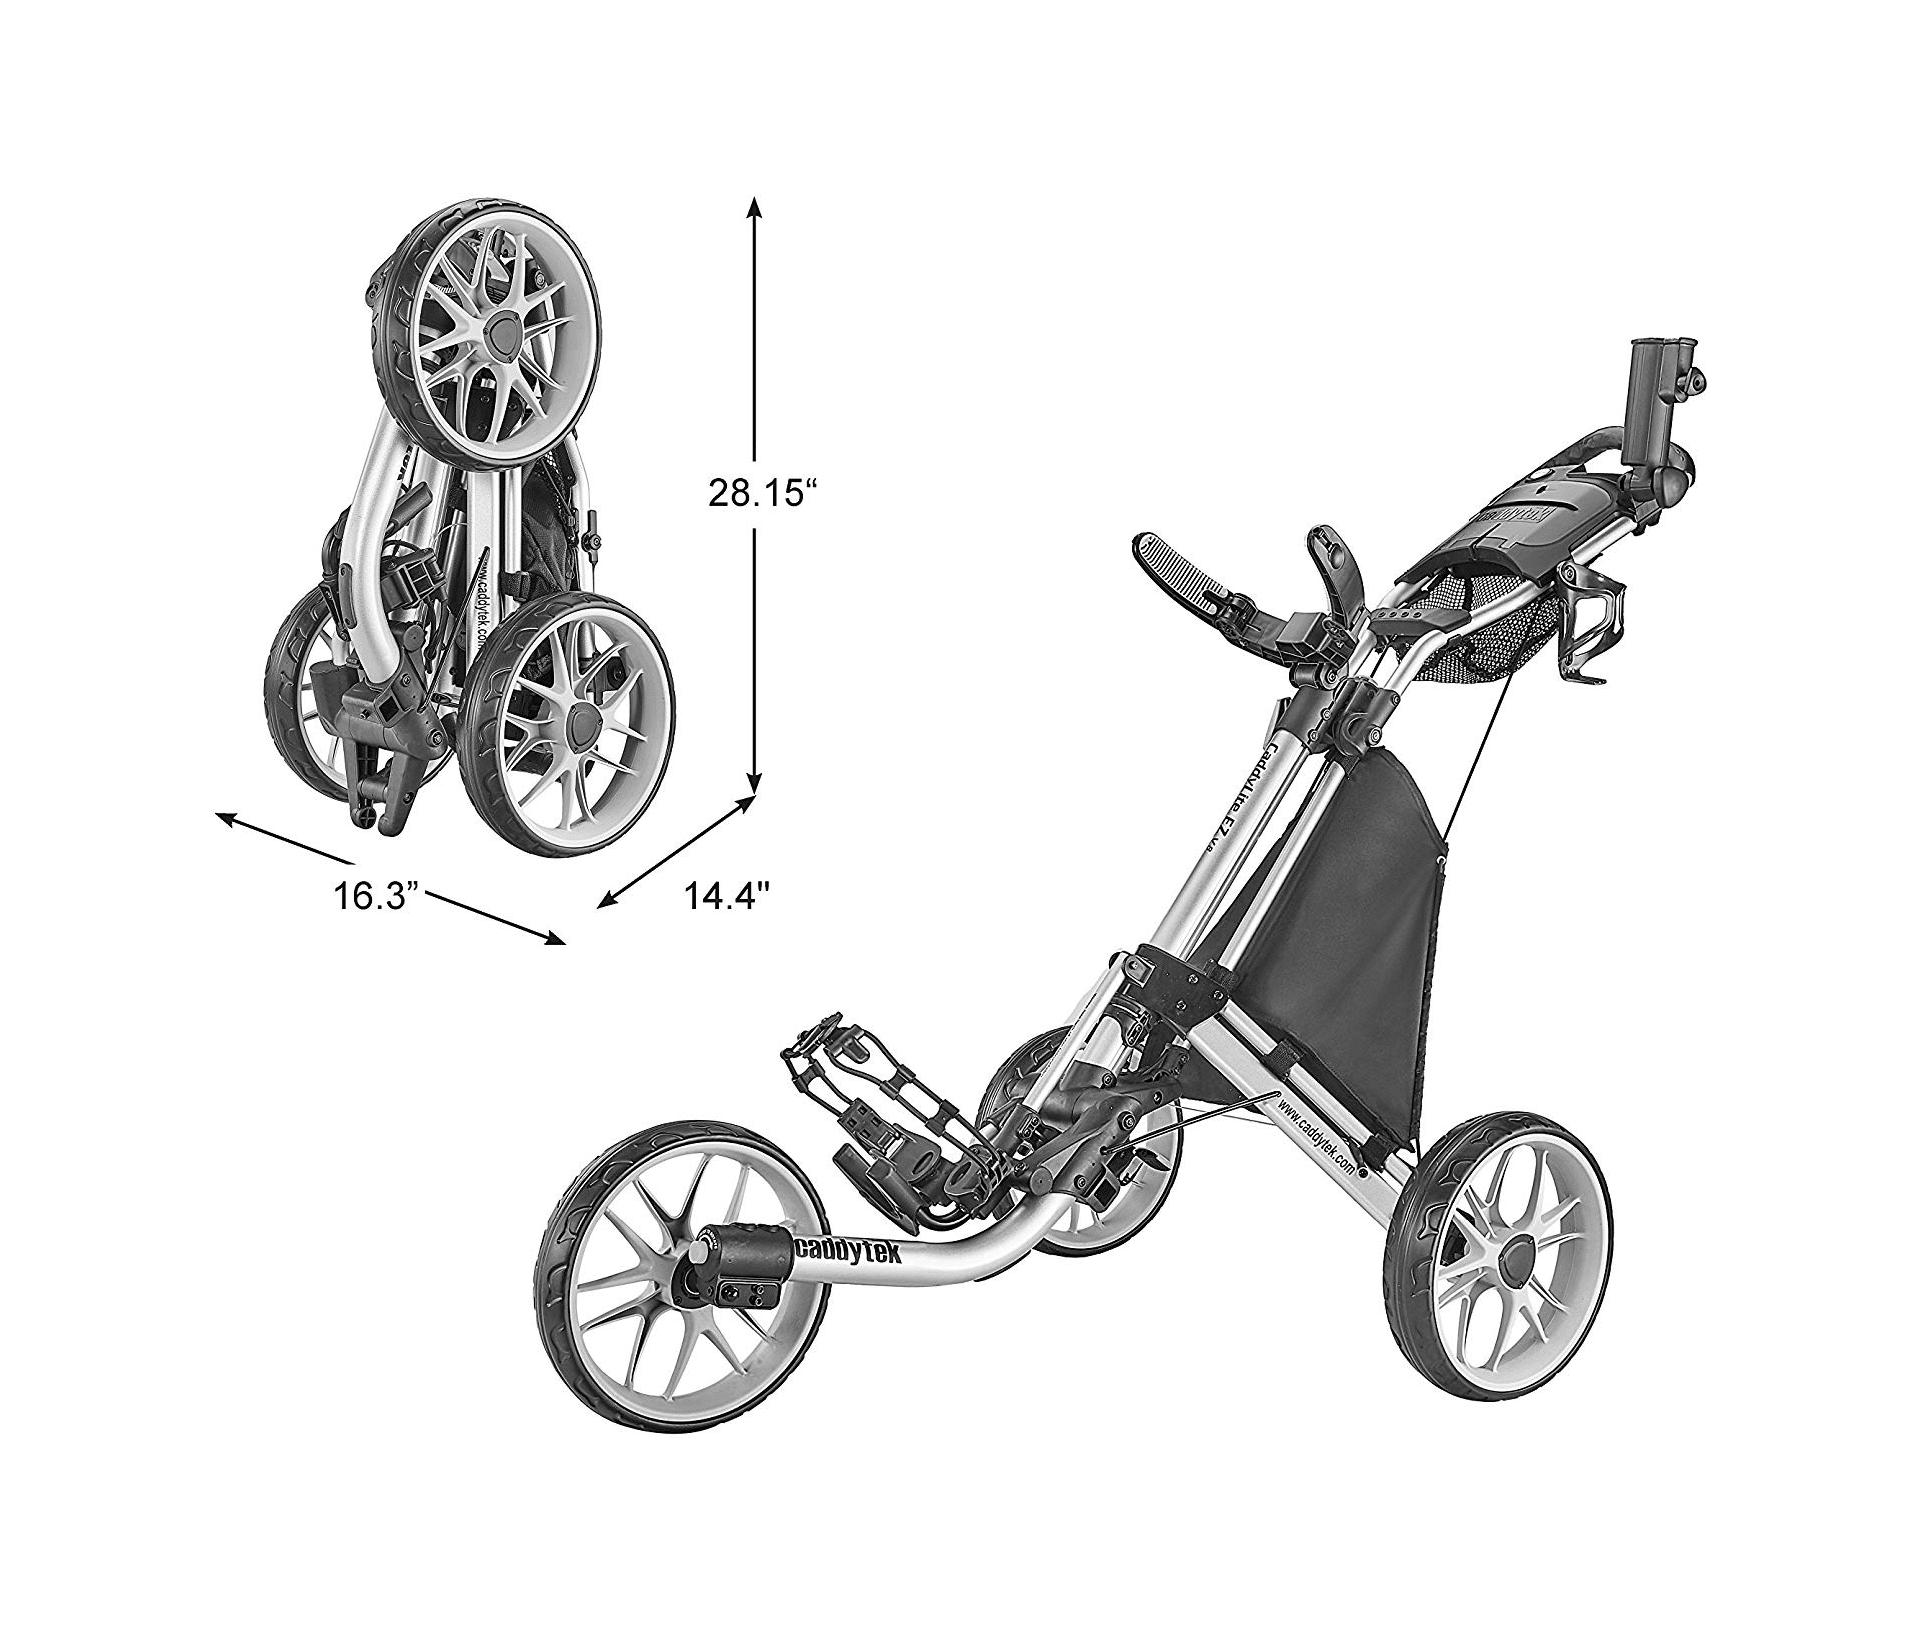 CaddyTek Caddylite EZ V8 – EZ-Fold 3 Wheel Golf Push Cart